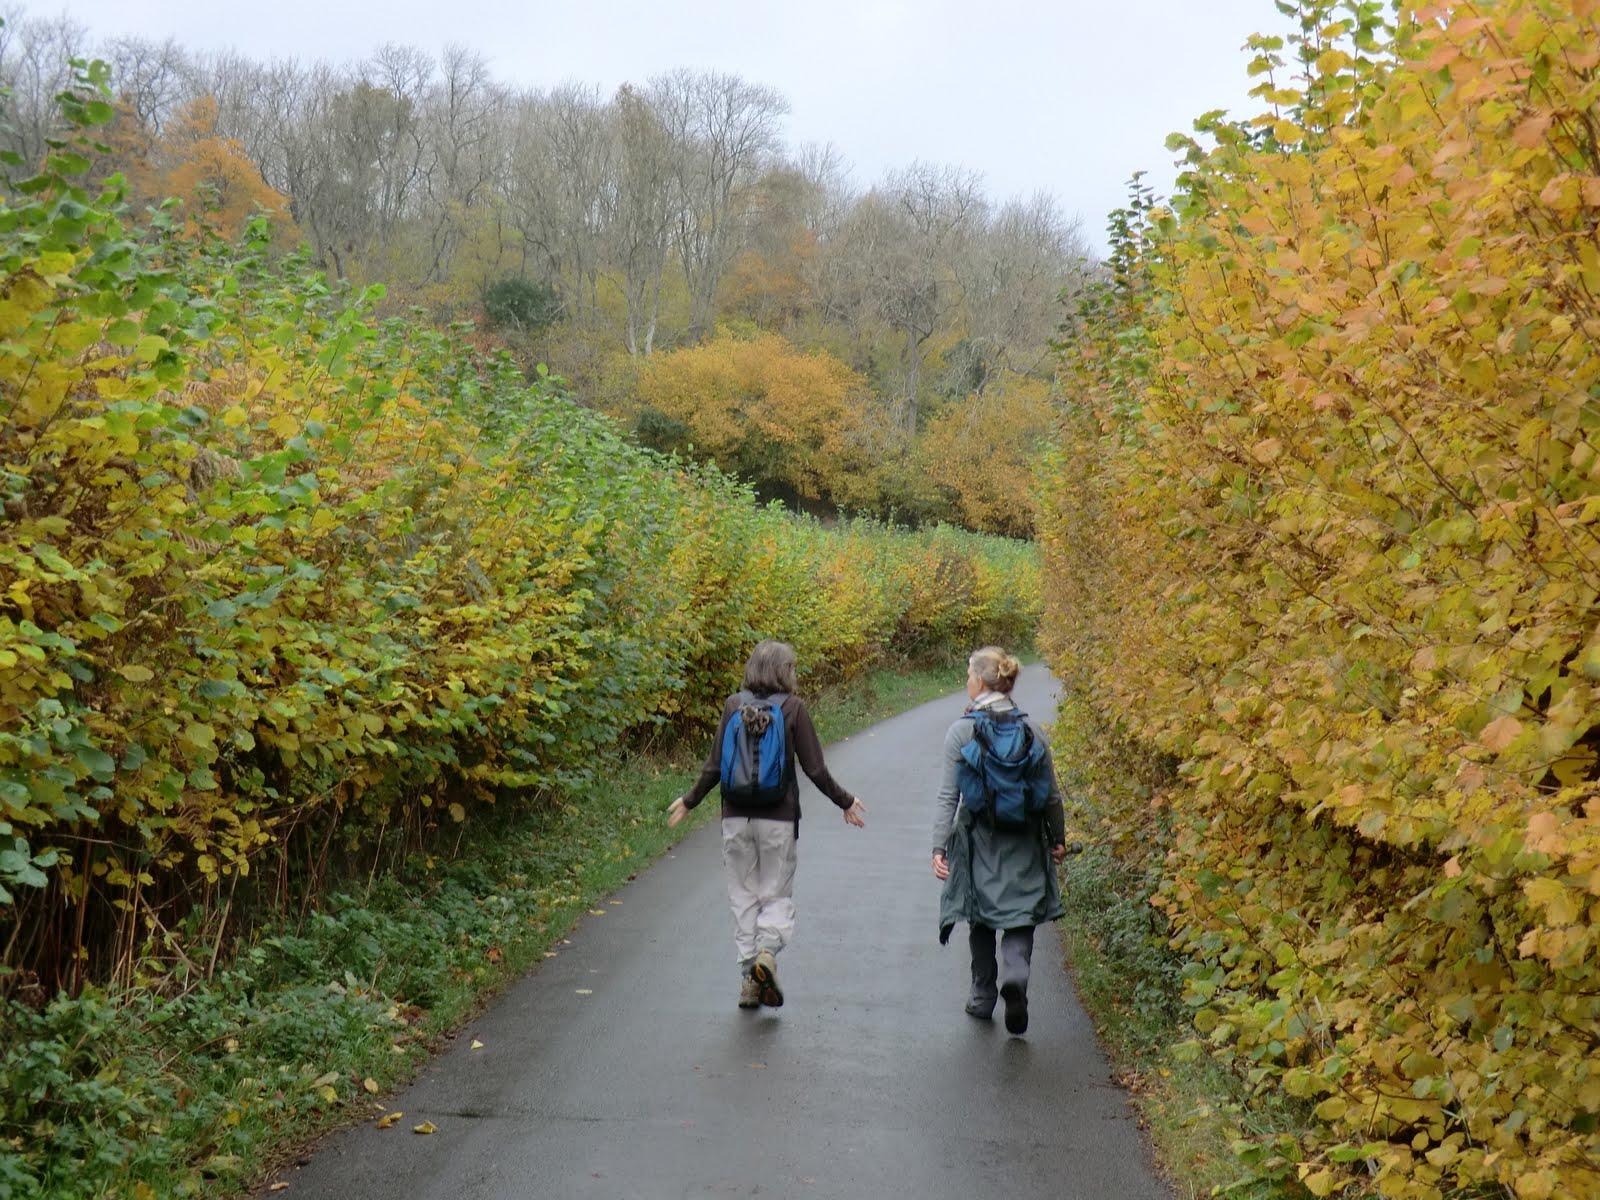 CIMG0206 Autumn colours on Forge Road